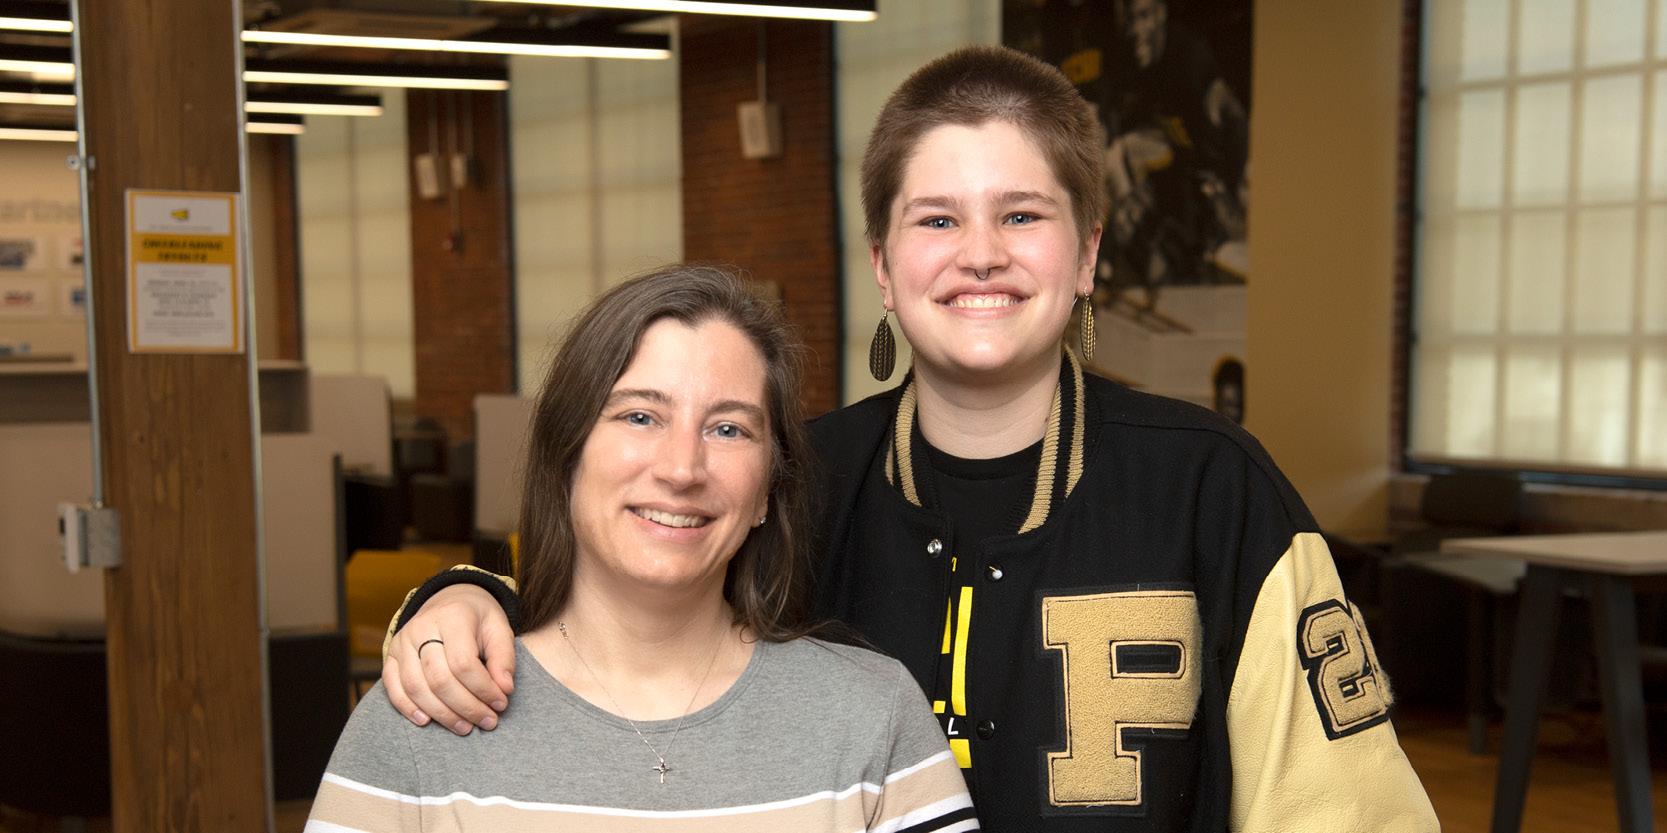 Casady Williamson and daughter Audrey (Purdue University photo)